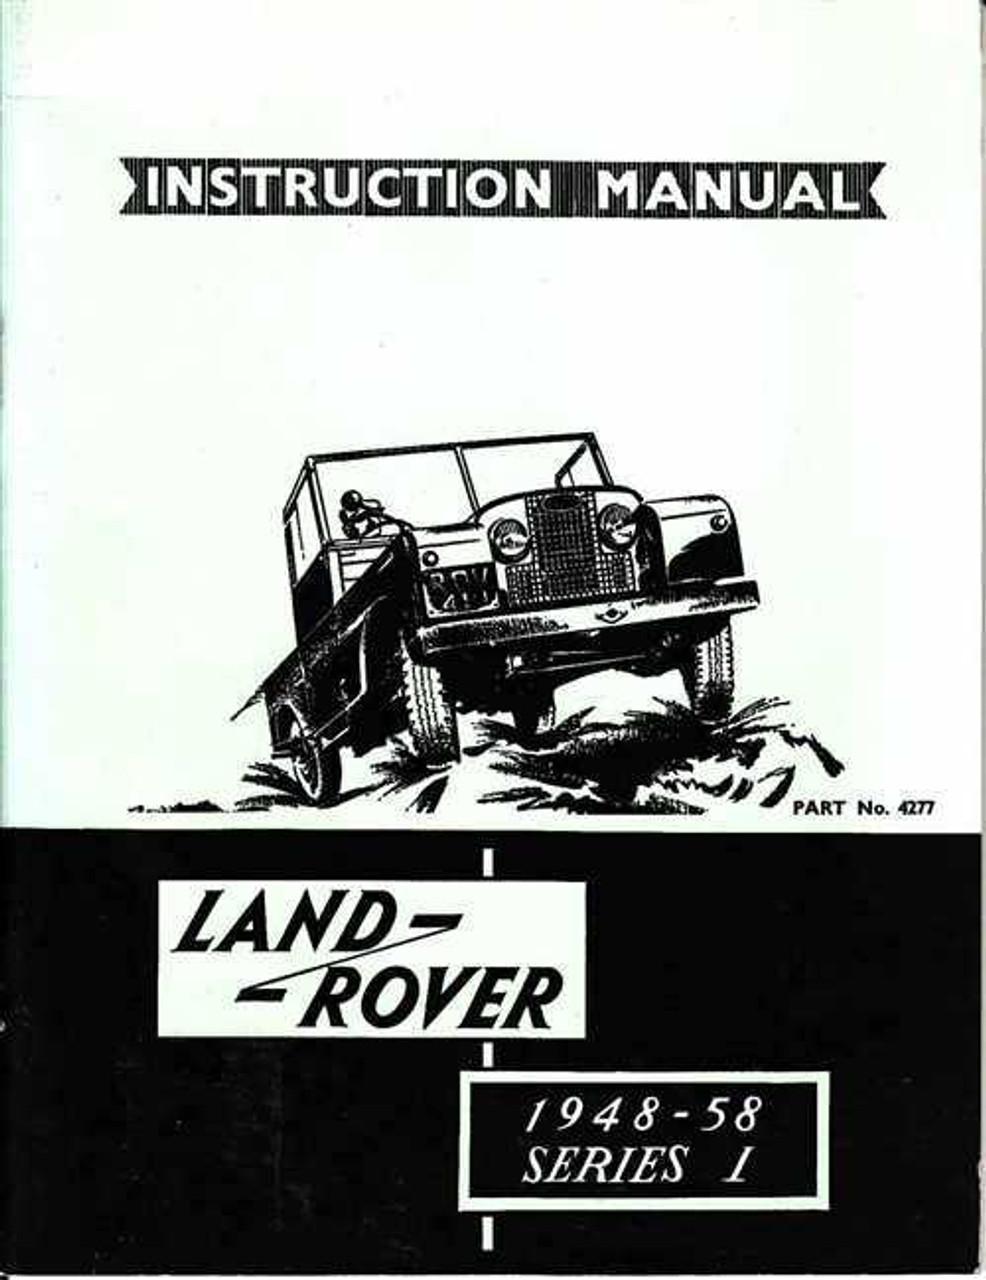 land rover series 1 1948 1958 instruction manual rh automotobookshop com au land rover series 1 manual land rover series 1 parts manual